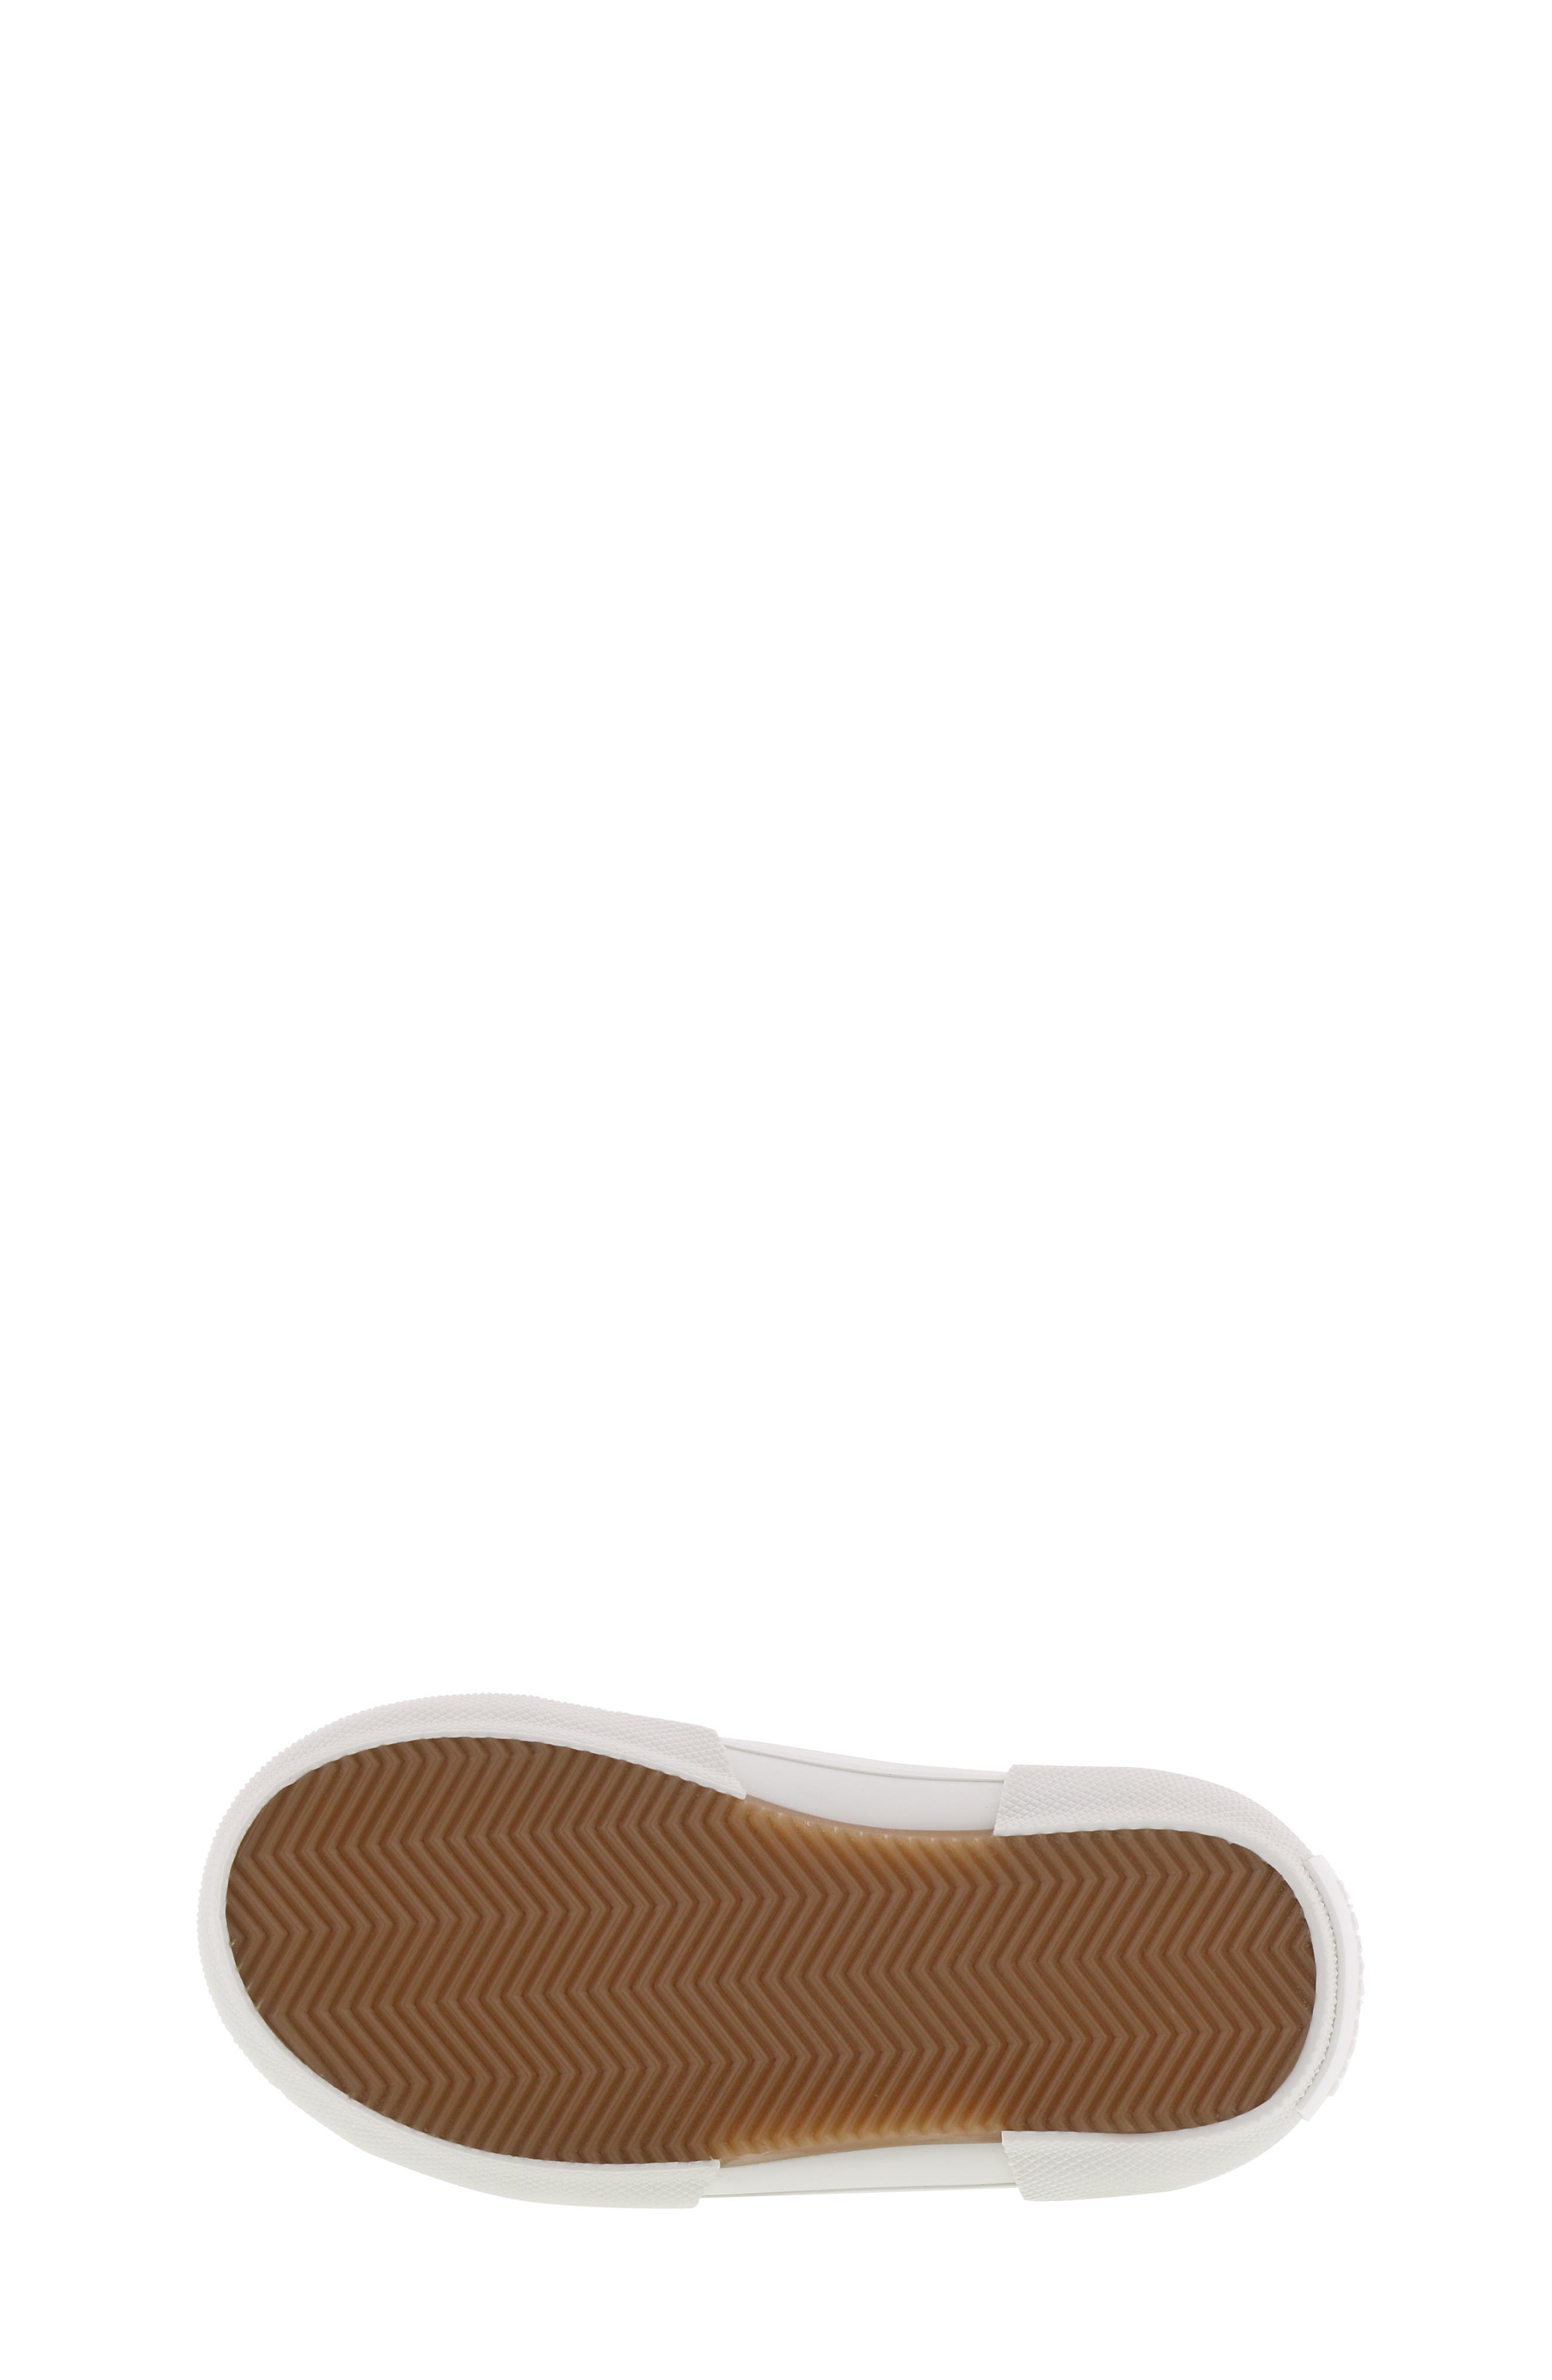 MICHAEL MICHAEL KORS,                             Ima Tinsel Sneaker,                             Alternate thumbnail 6, color,                             GUNMETAL